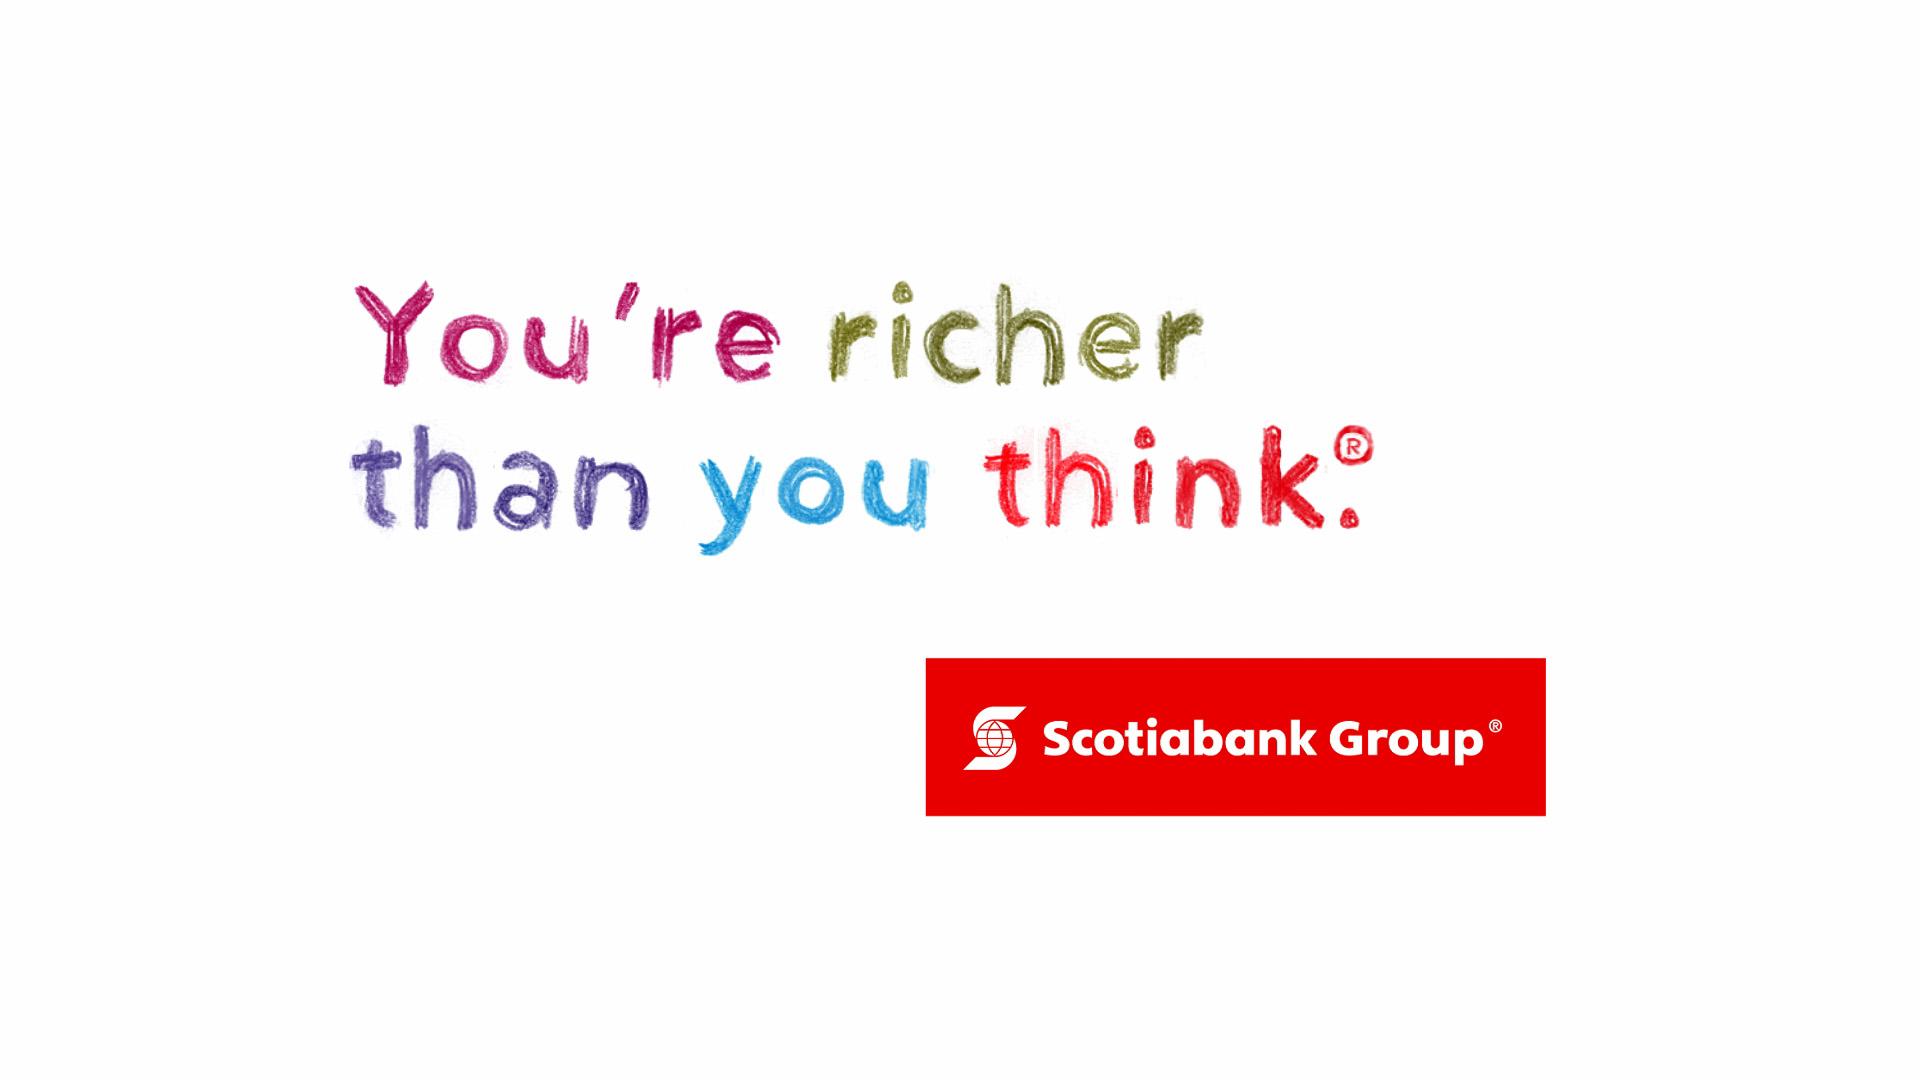 scotiabank_met_image04